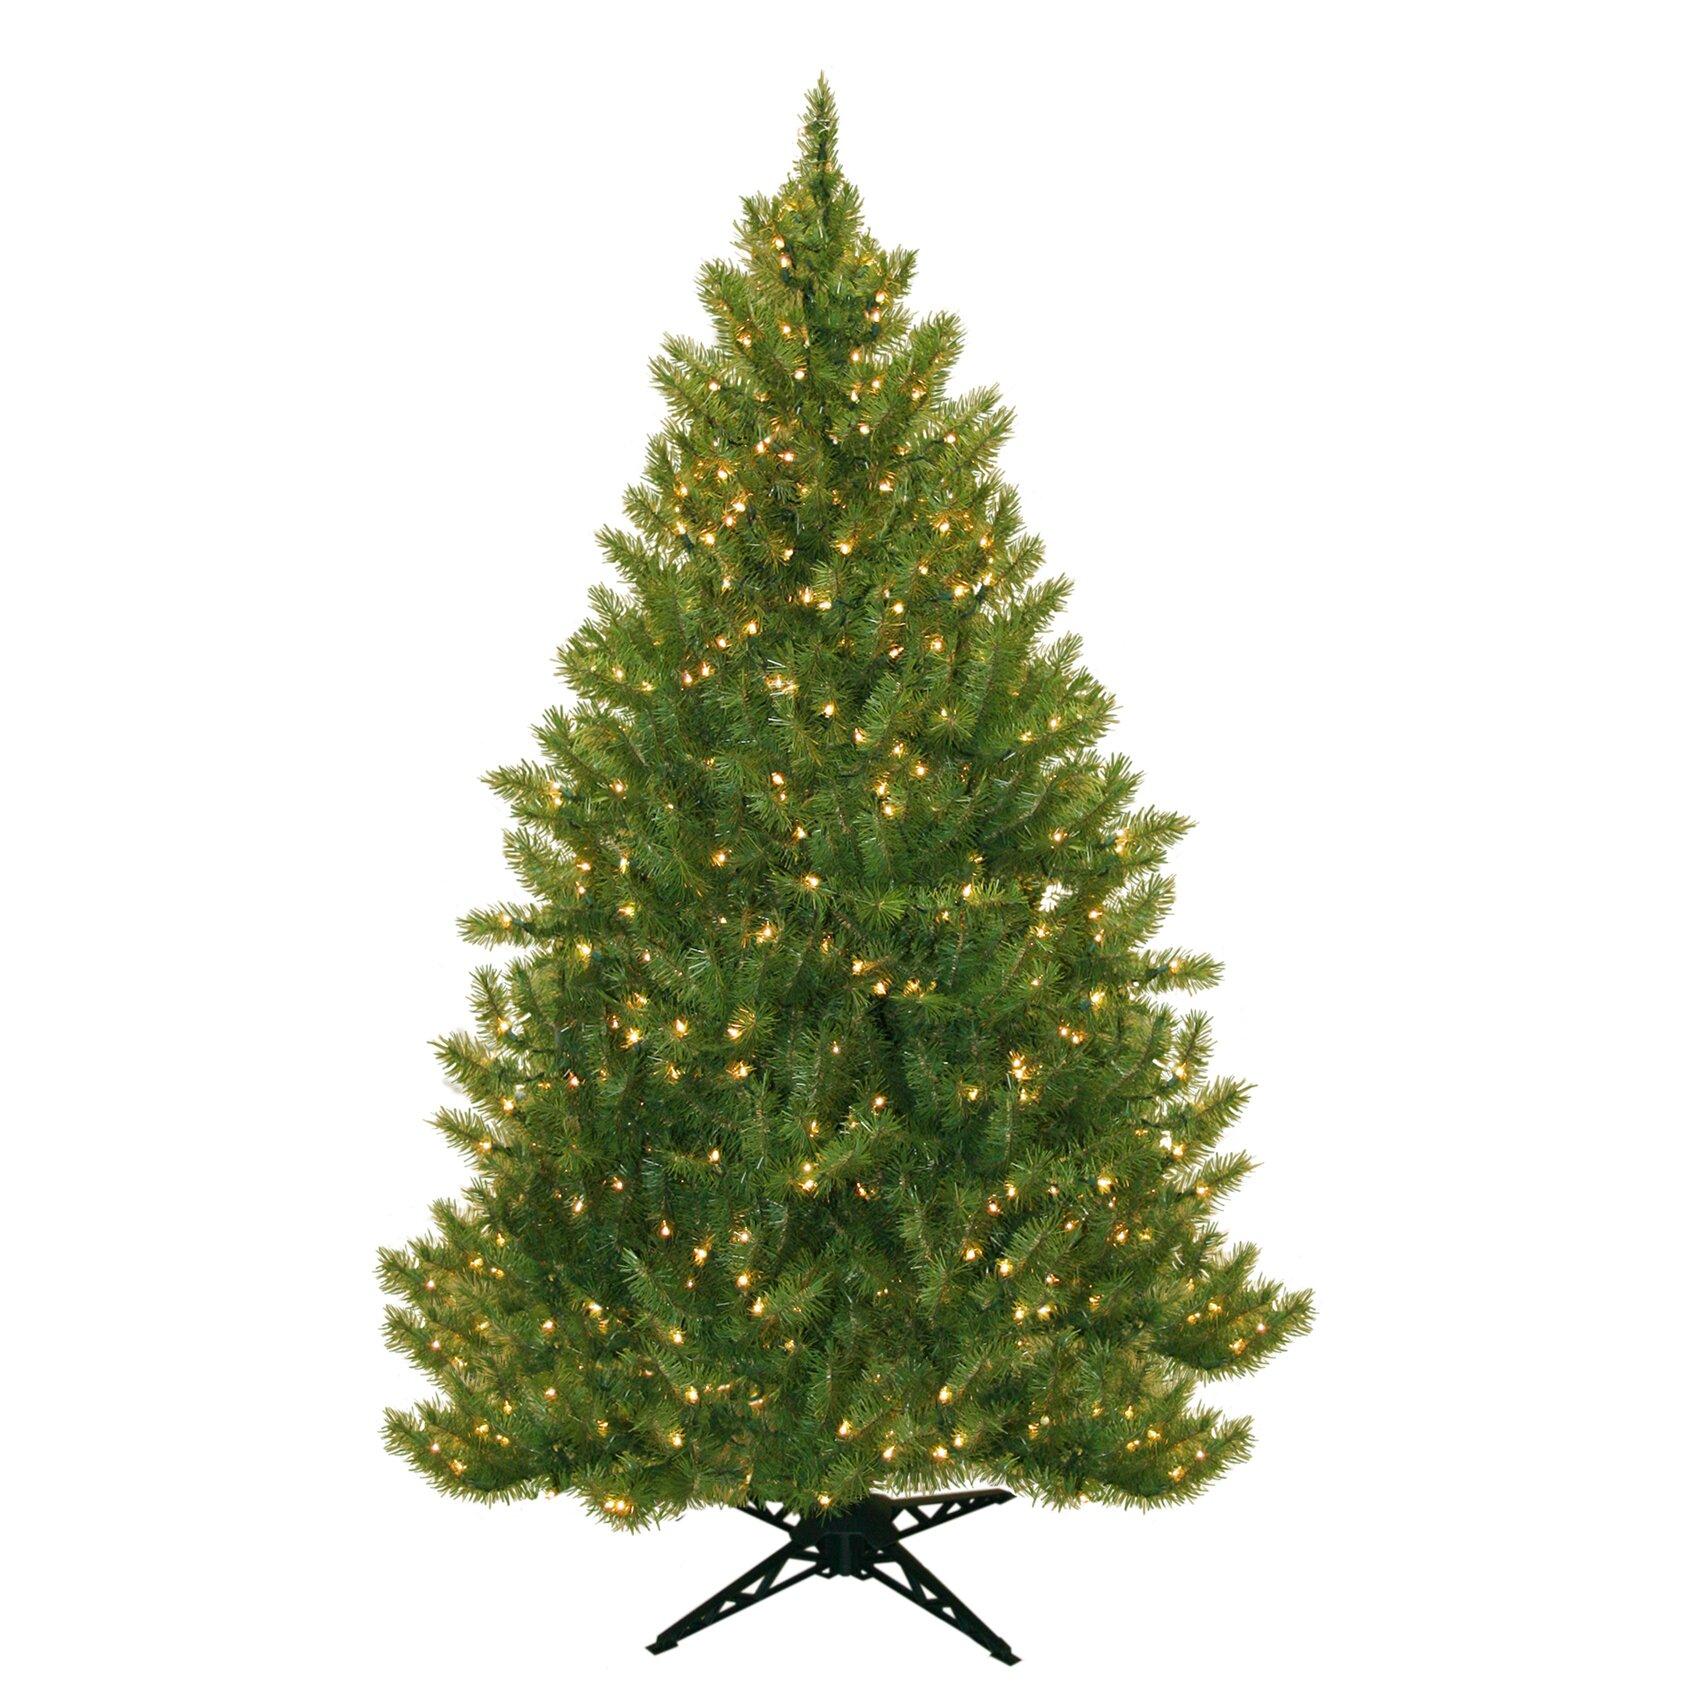 3 Foot Pre Lit Artificial Christmas Tree